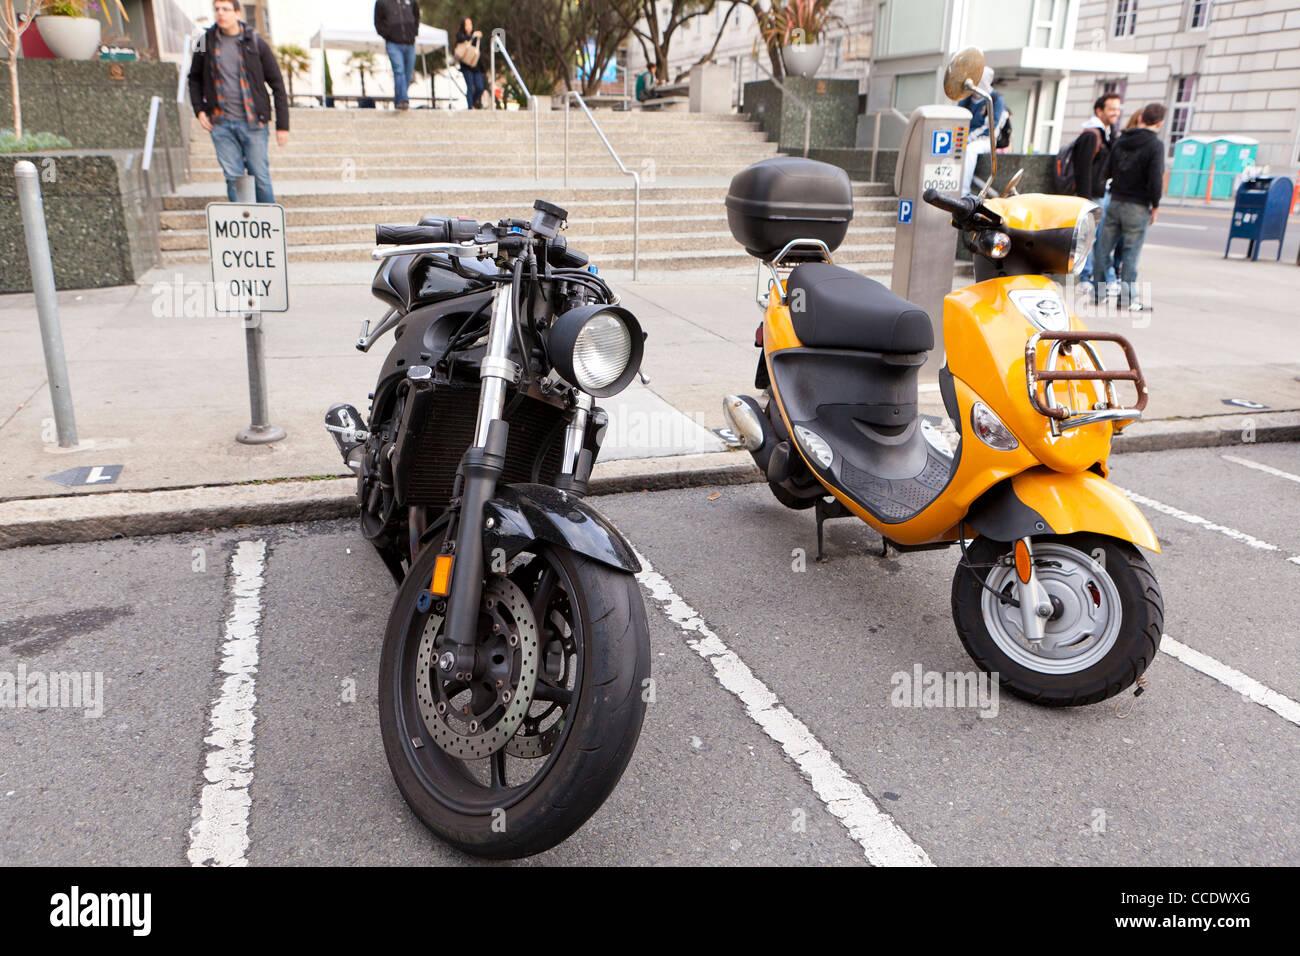 Motorcycle parking spot - Stock Image